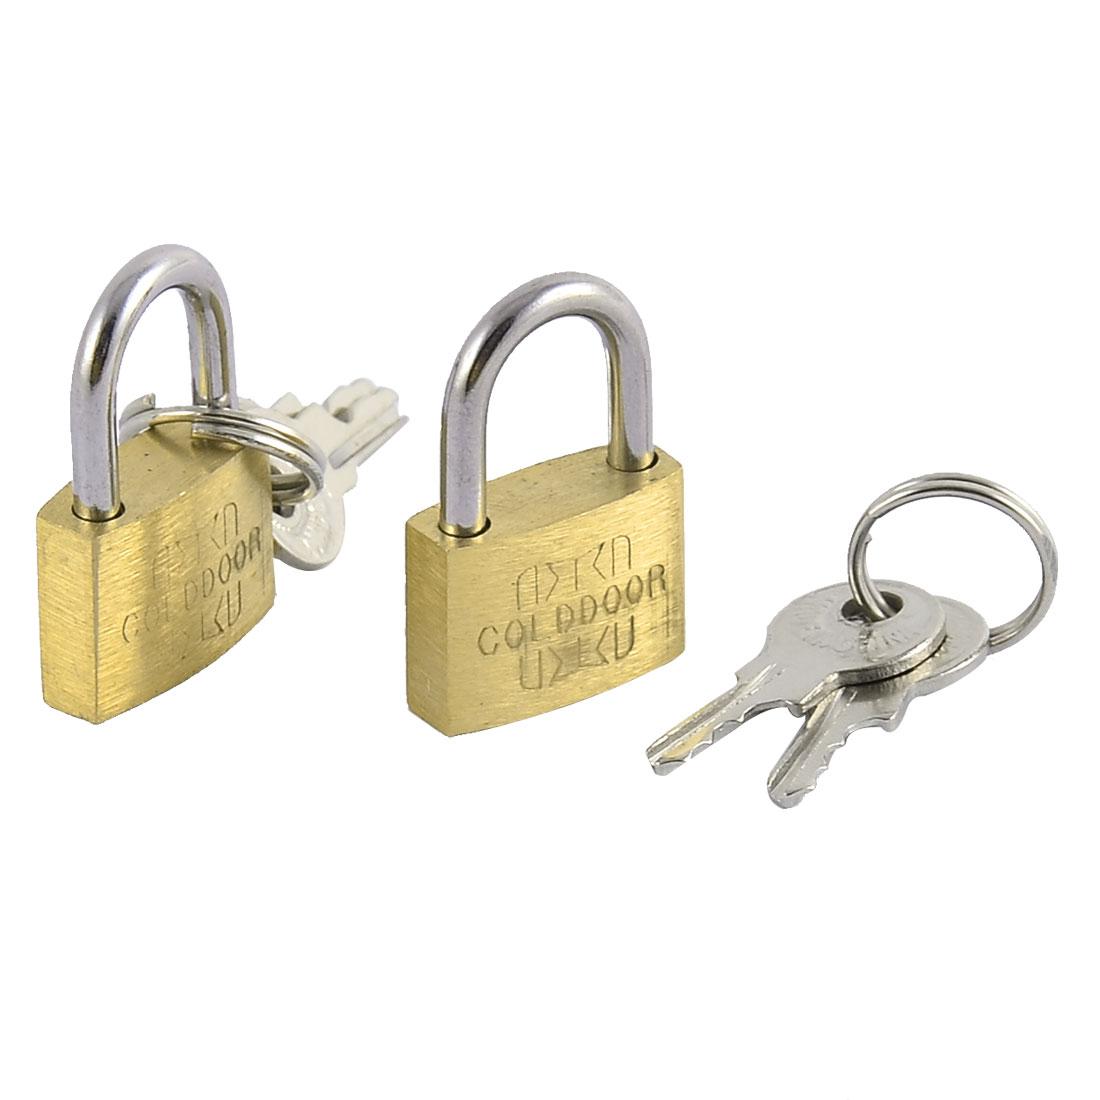 Home Office Door Drawer Cabinet Metal Security Lock Shackle Padlock Brass Tone 2pcs